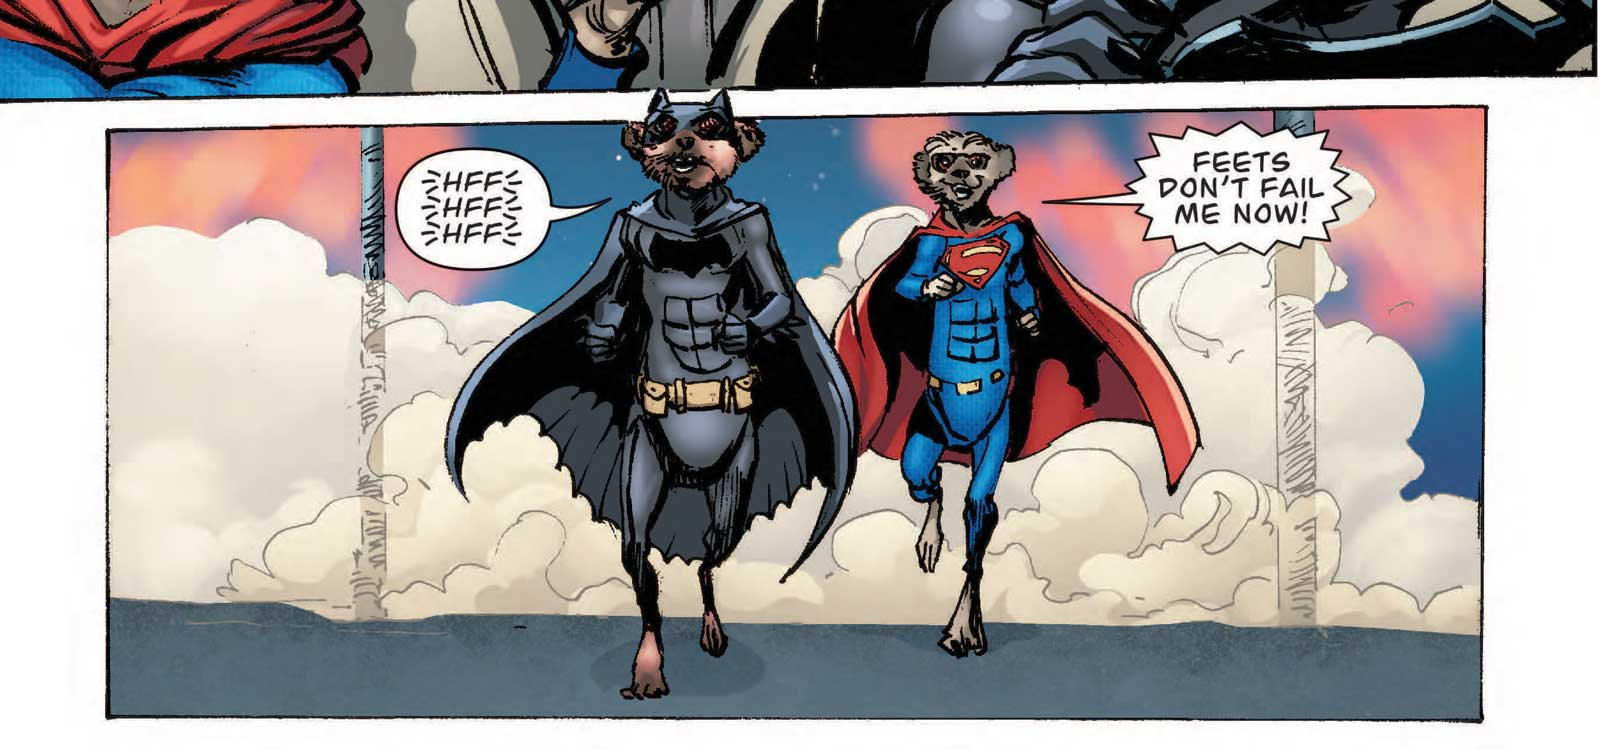 Meerkat Movies Comic - A Heroic Journey #1 - SNIP